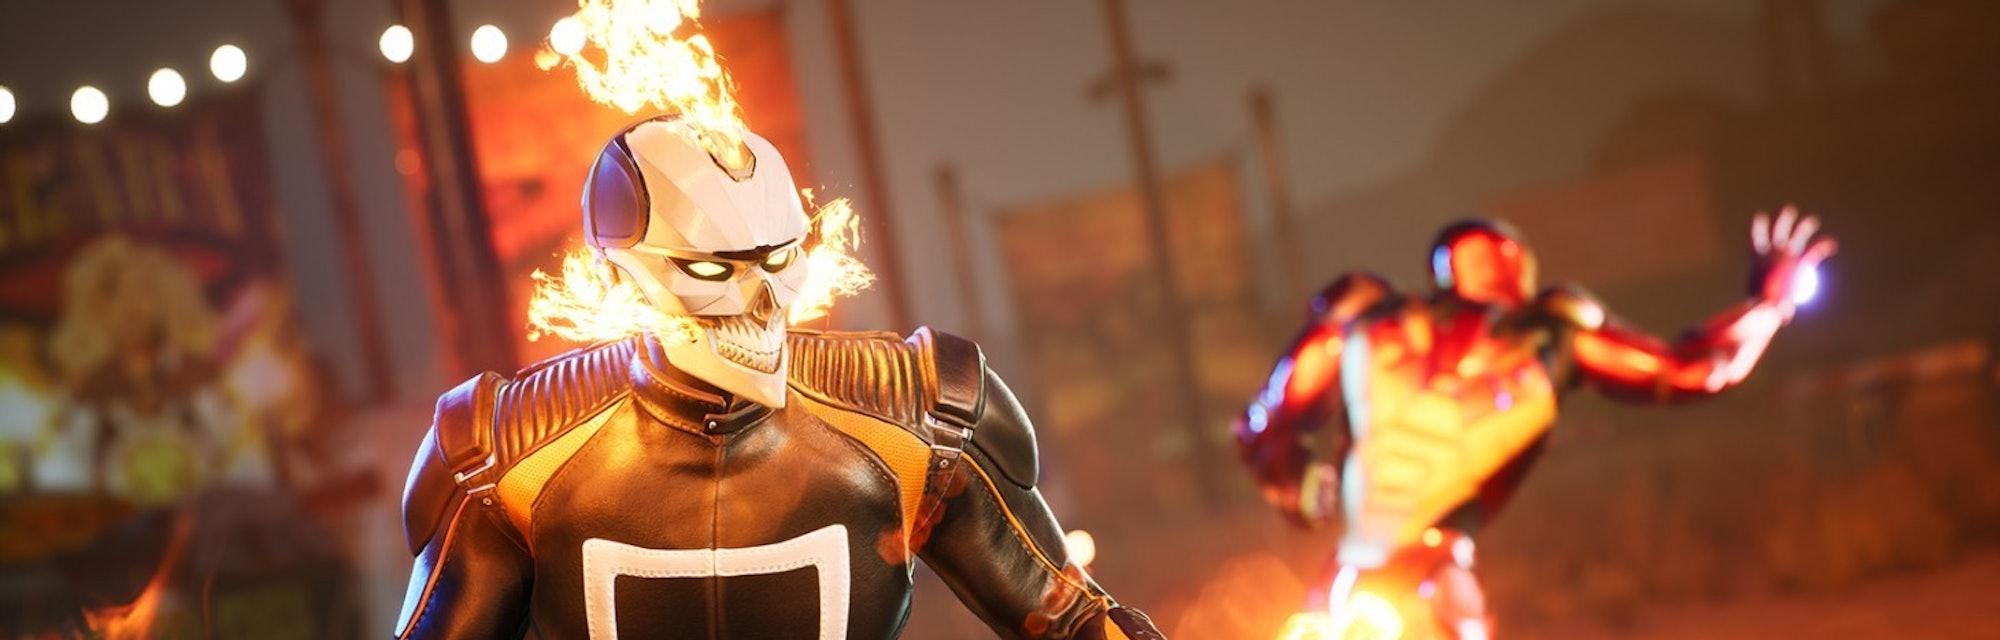 marvel's midnight suns ghost rider iron man